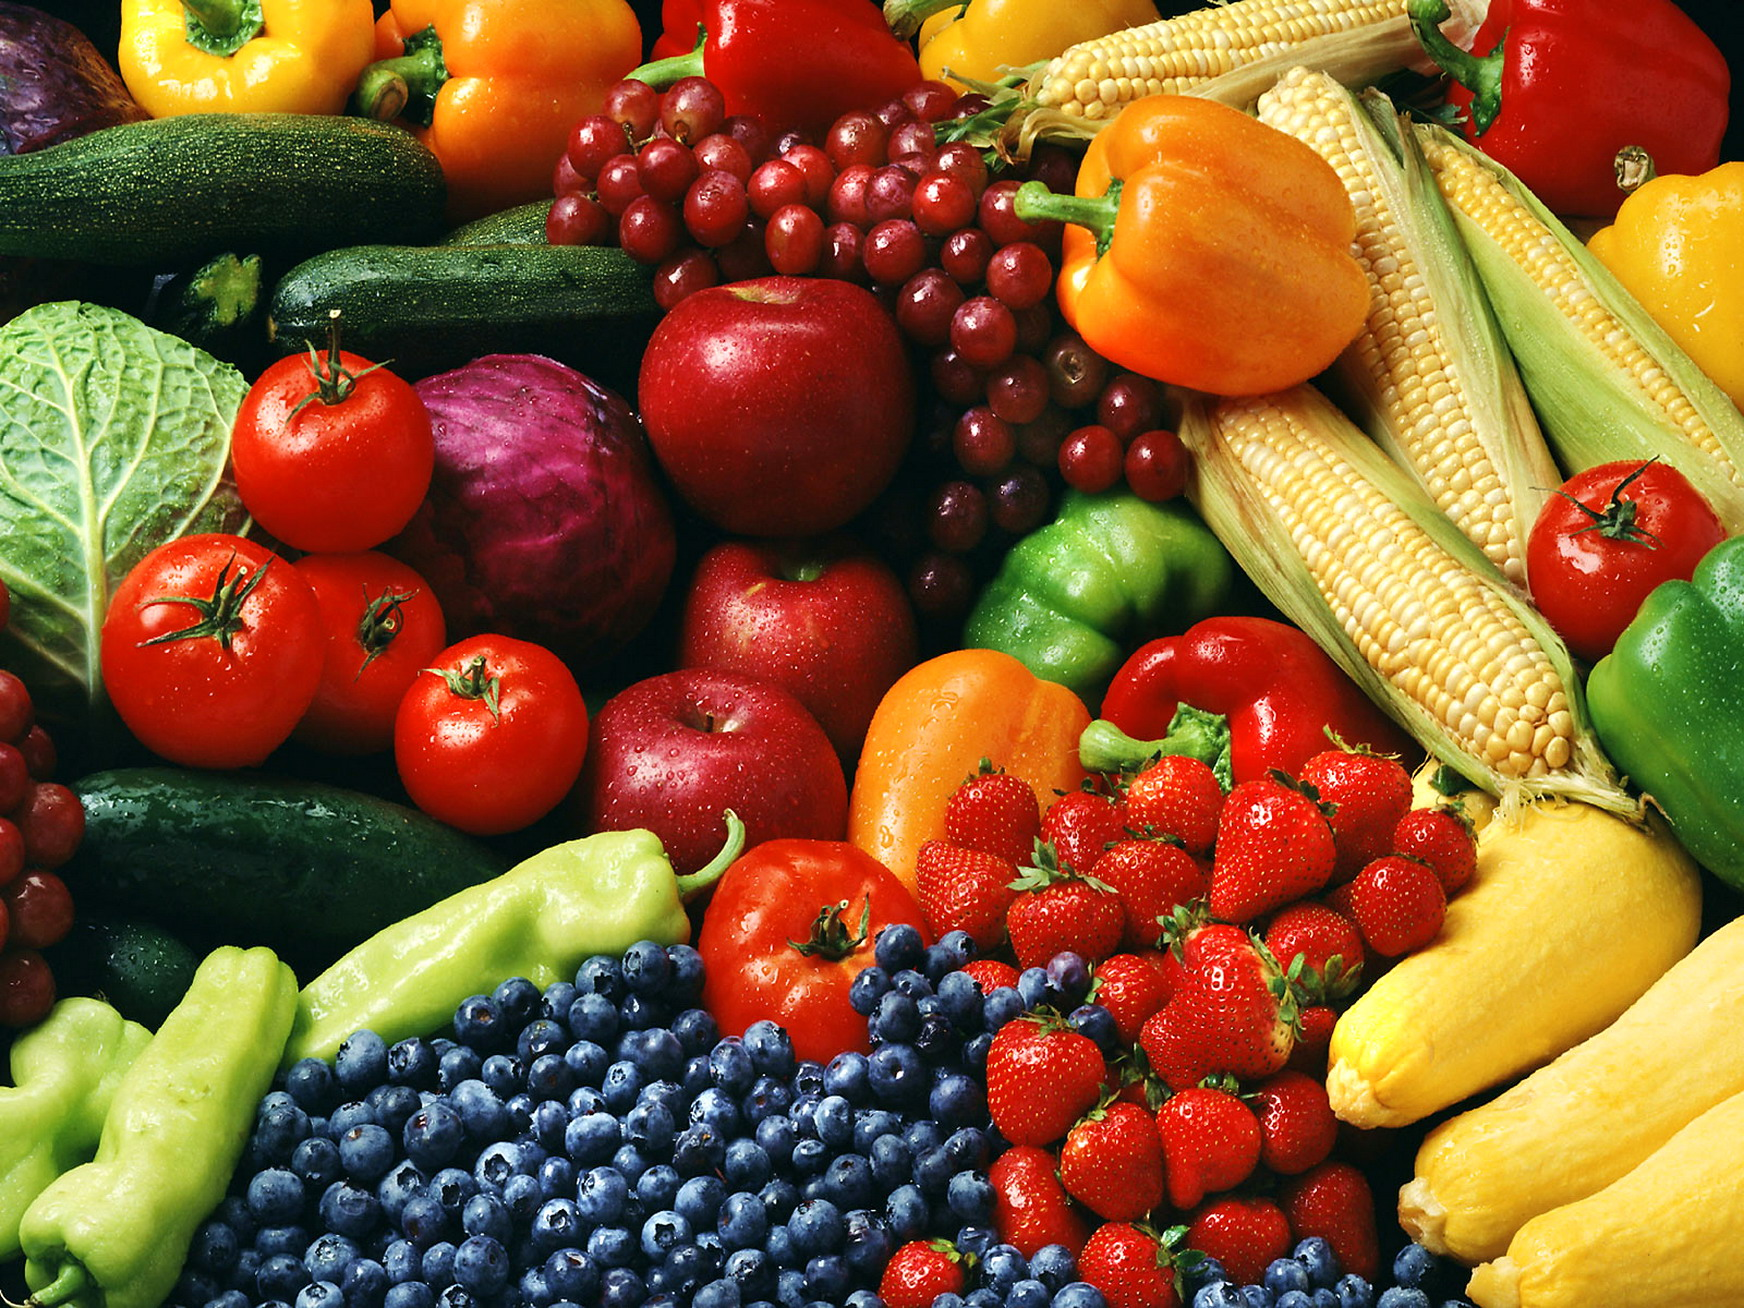 alimenti proibiti dieta sana